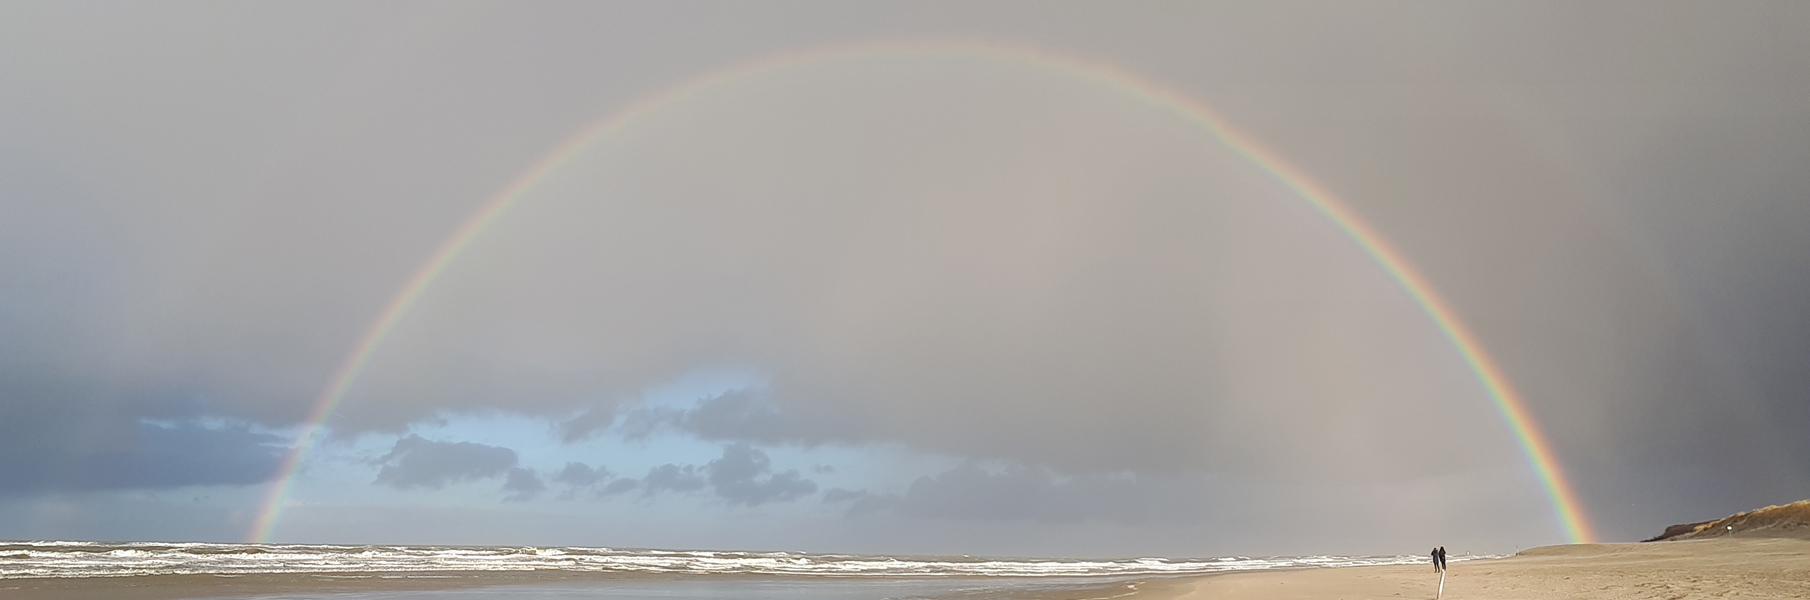 [Bild: 2020-01-29_Regenbogen.jpg]